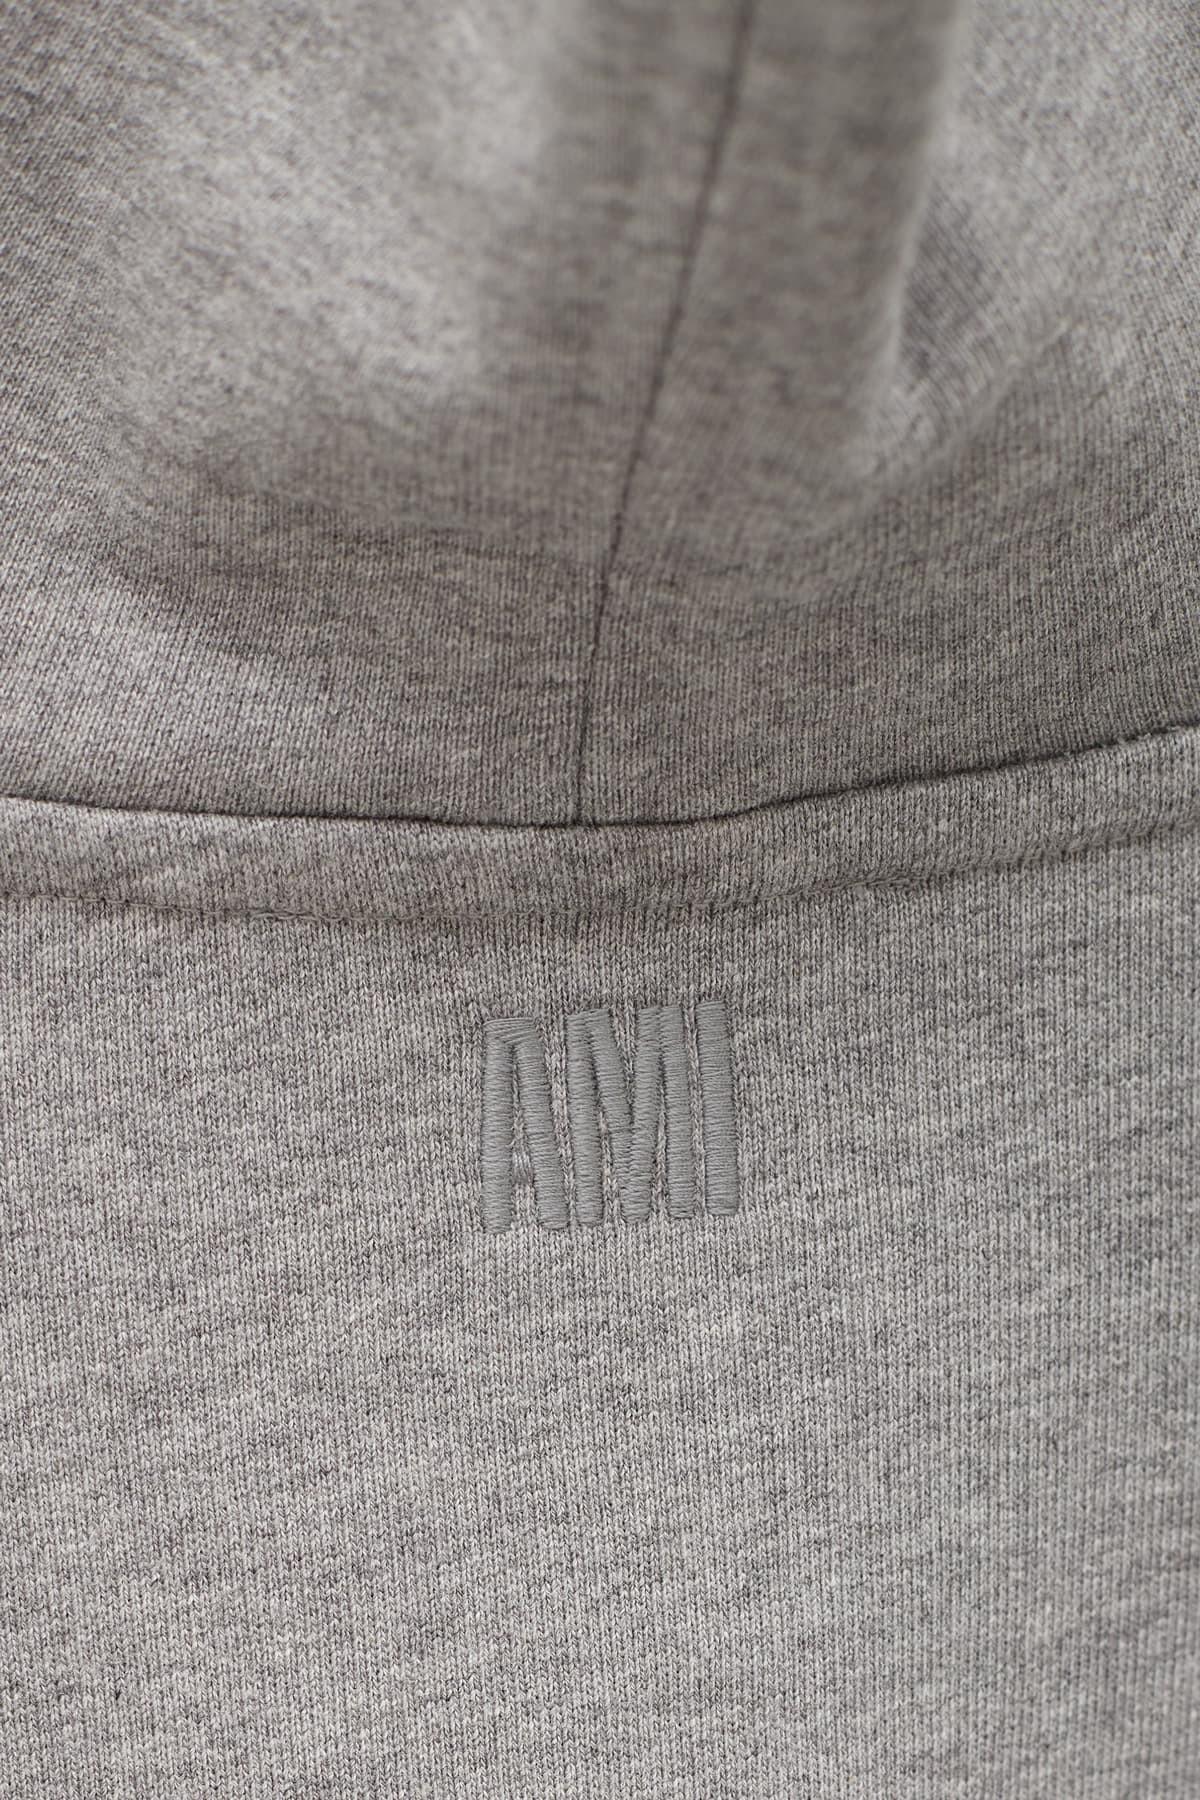 Comprar Sunnei Black Dreamy Alaska Boots